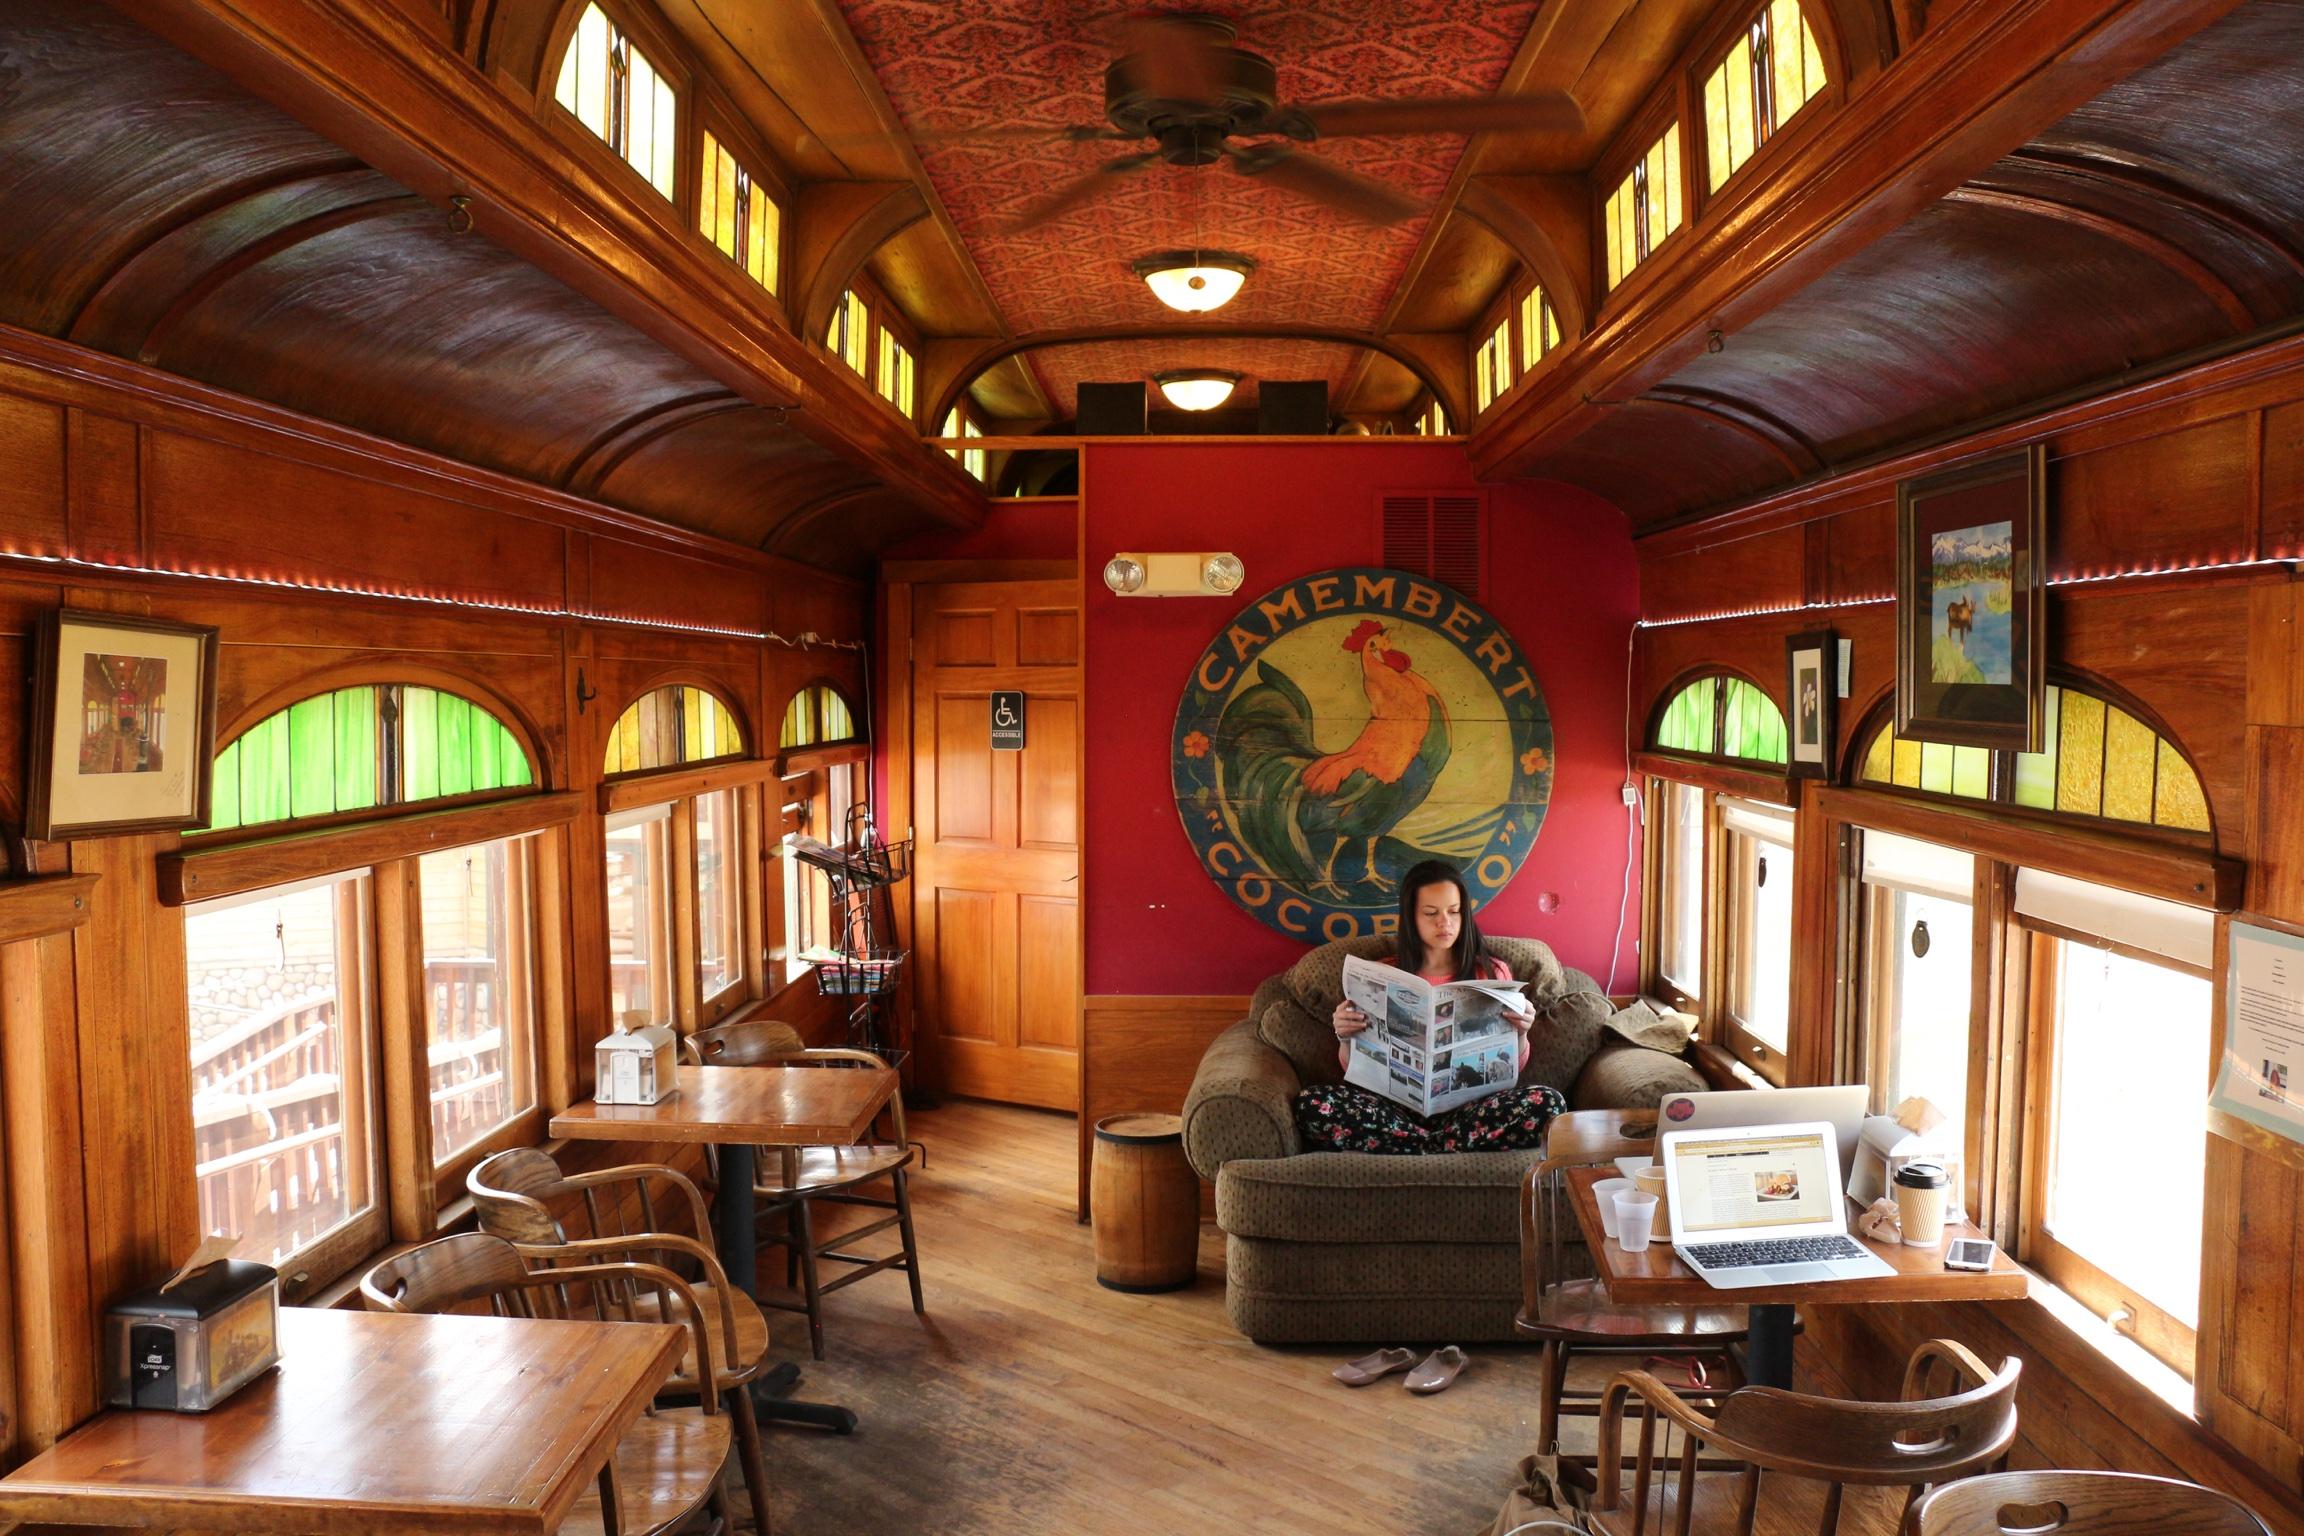 nederland_traincars-18.jpg